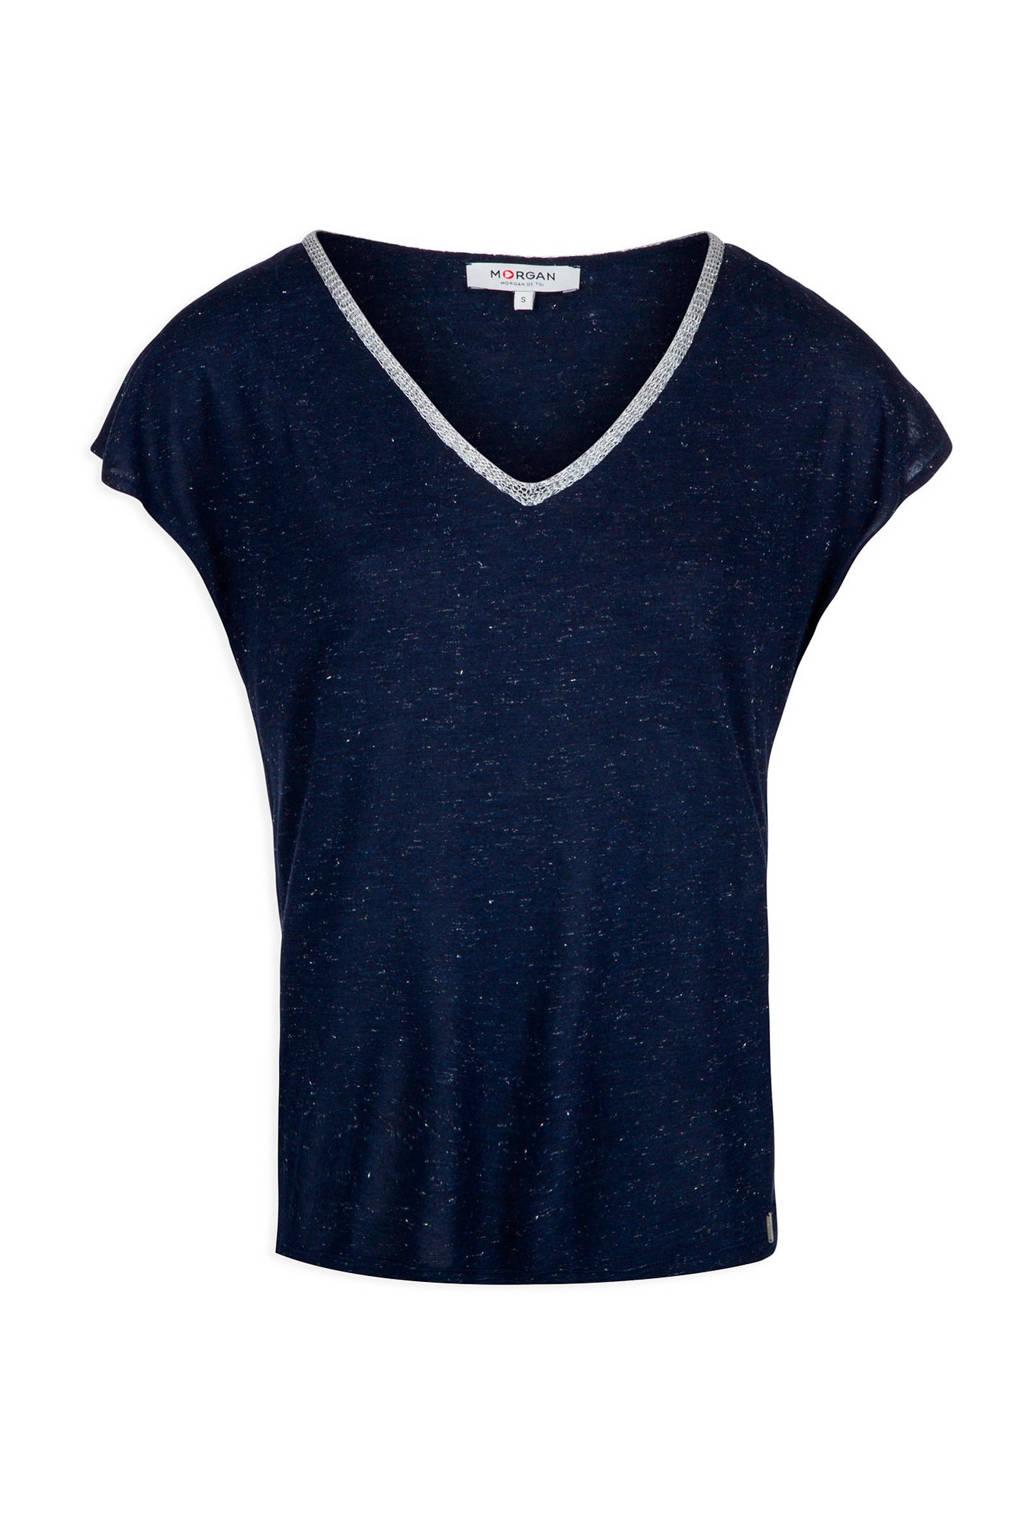 Morgan T-shirt met glitters marine, Marine